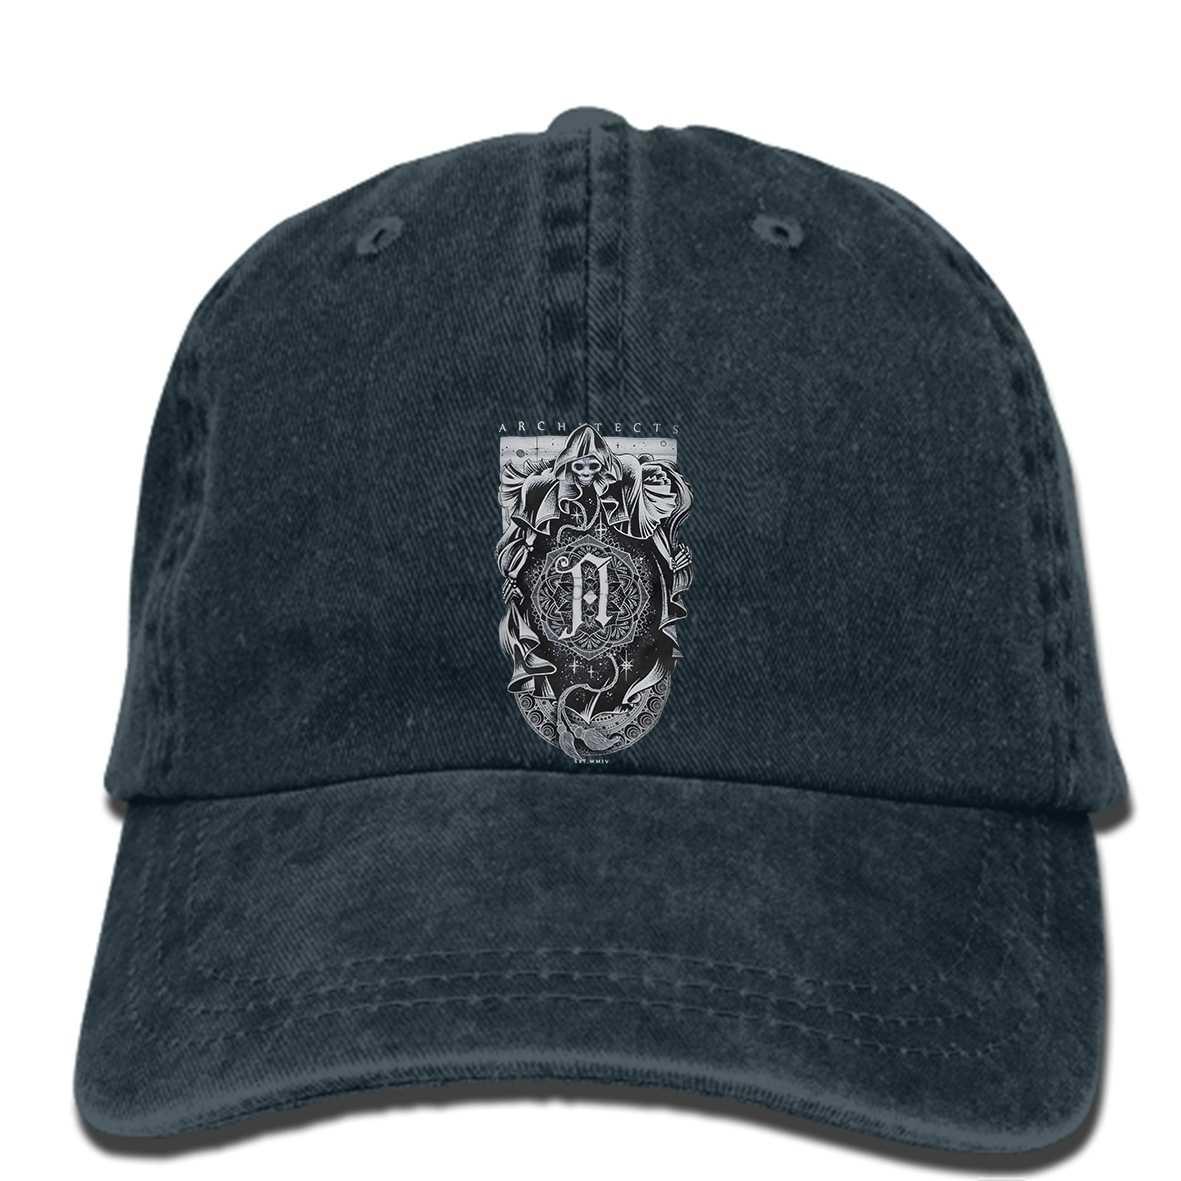 01ba7f37eb0e6 hip hop Baseball caps Official Architects Reaper Unisex cap Merch Rock  Album Music Daybreaker Band hats